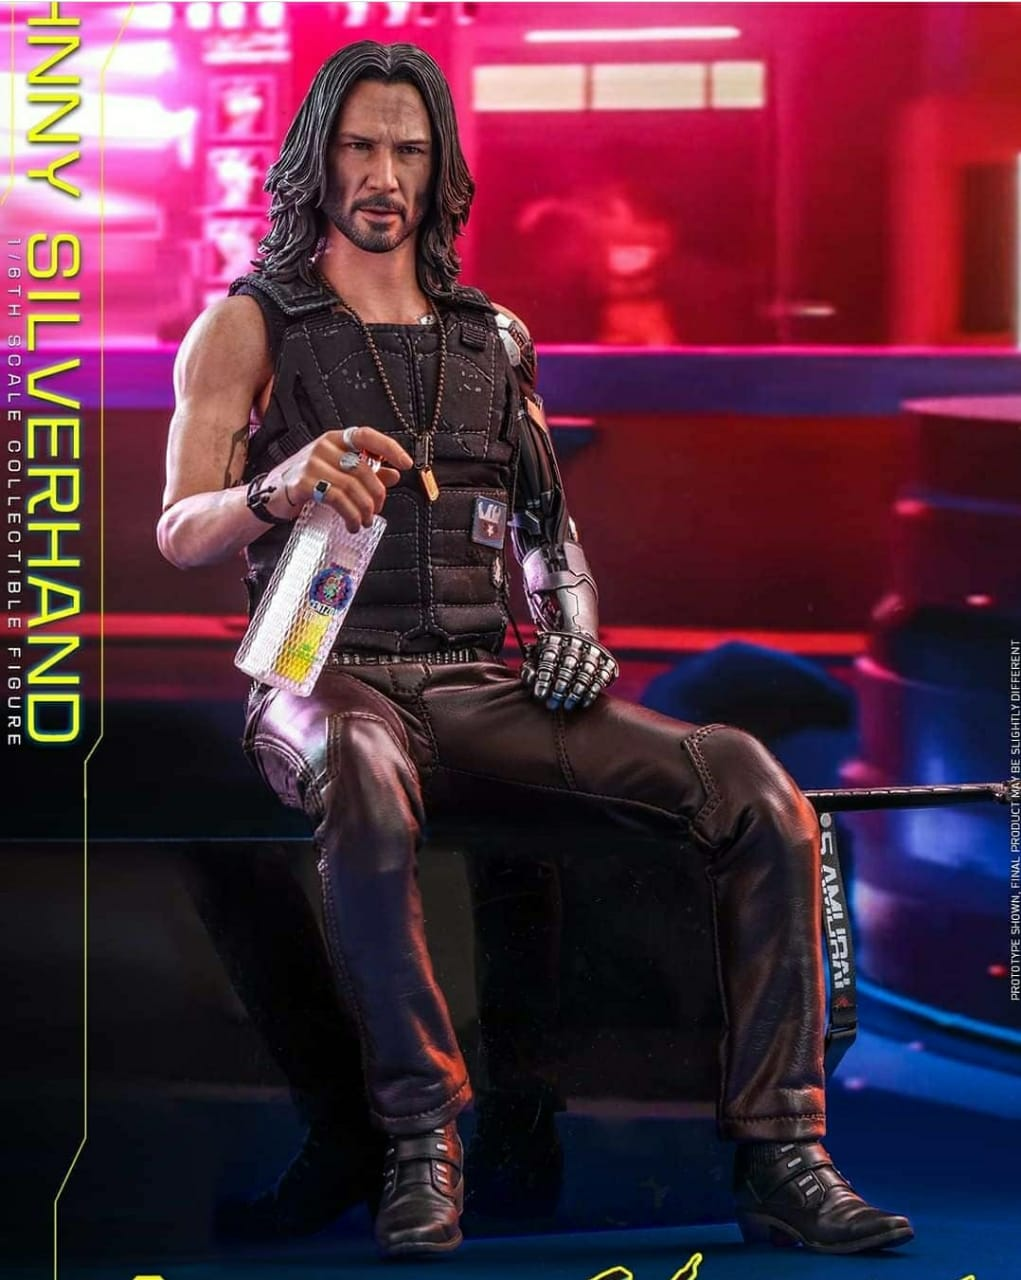 PRÉ VENDA: Action Figure Johnny Silverhand: Cyberpunk 2077 (VGM47) (Escala 1/6) - Hot Toys